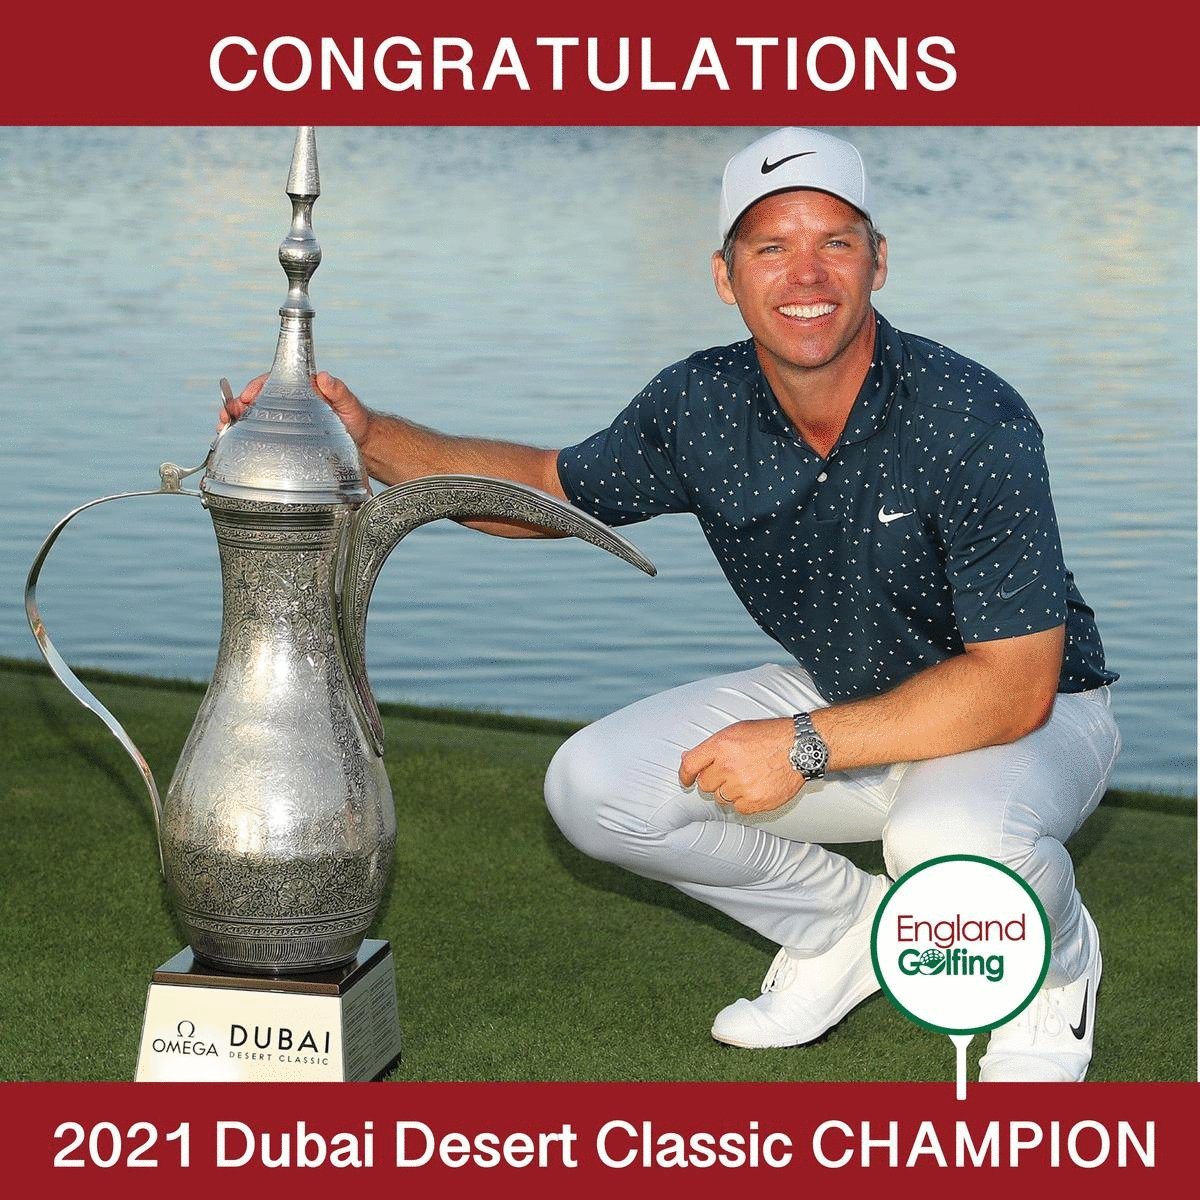 HUGE congratulations goes to Paul Casey  👏👏  Your 2021 Dubai Desert Classic CHAMPION 🏆  @Paul_Casey   @nikegolf   @TitleistEurope   @EuropeanTour   @OMEGAGolfDubai   @EmiratesGC   @visitdubai   #EuropeanTour #ODDC #MadeForGreatness #TimeToMakeHistory